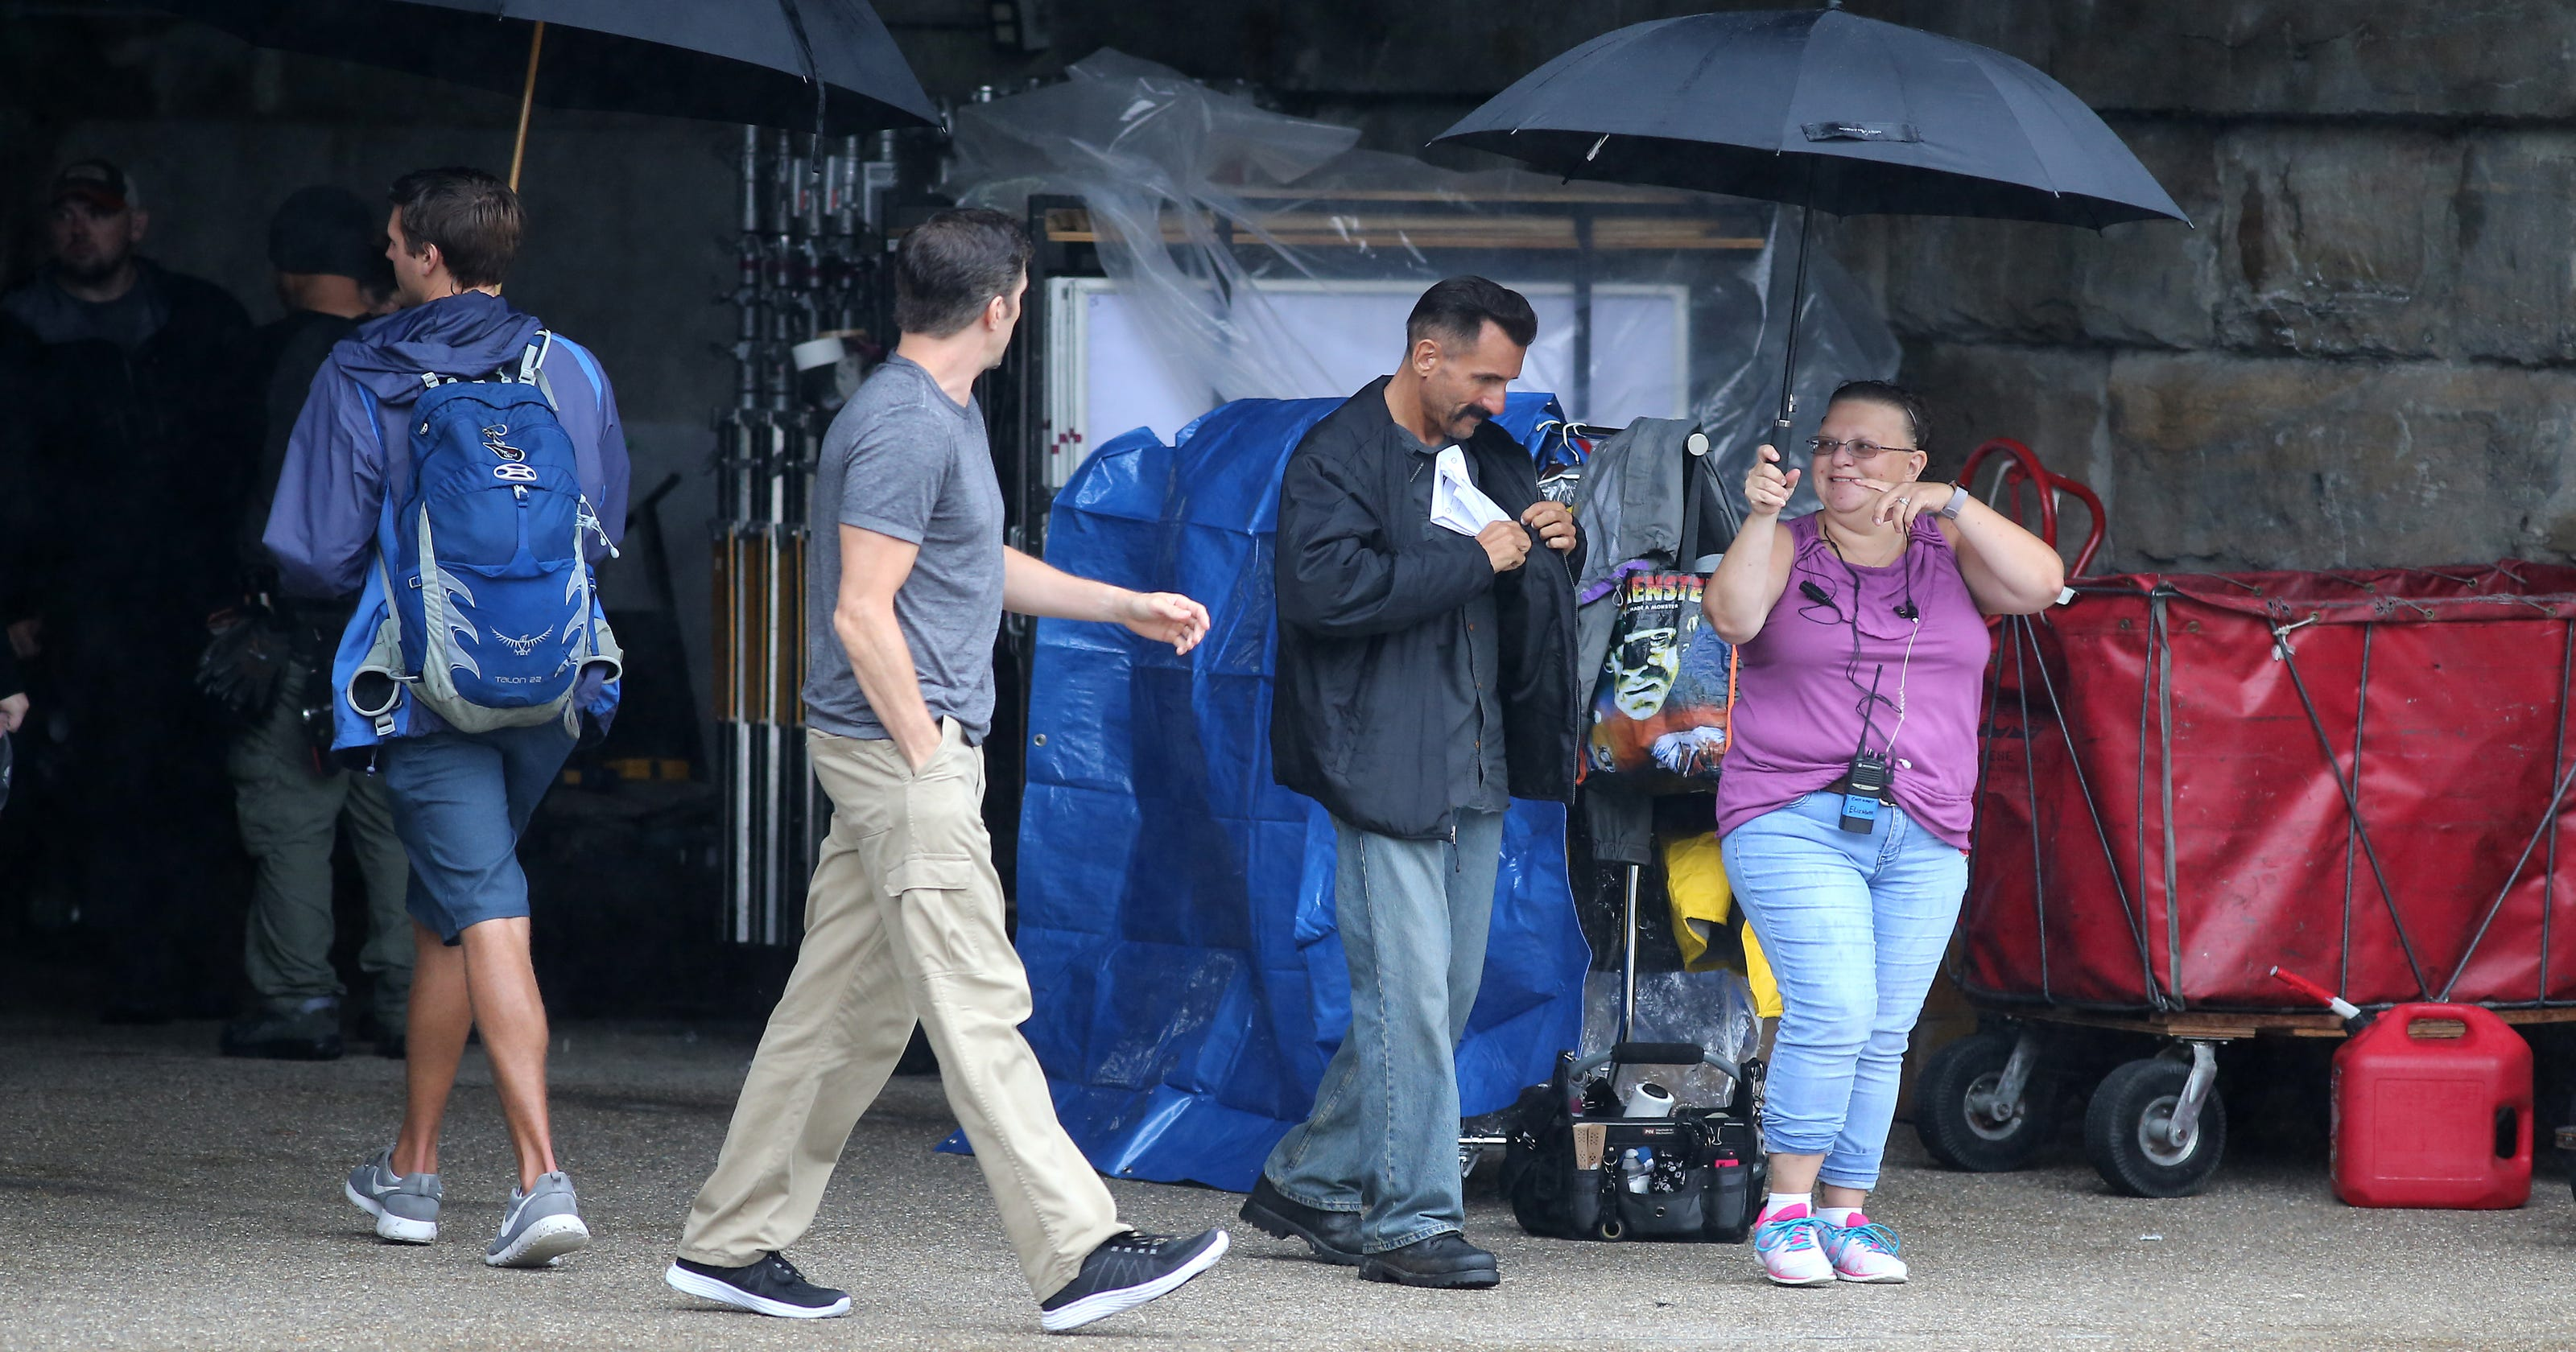 Bruce Willis Action Movie Reprisal Shot In Cincinnati